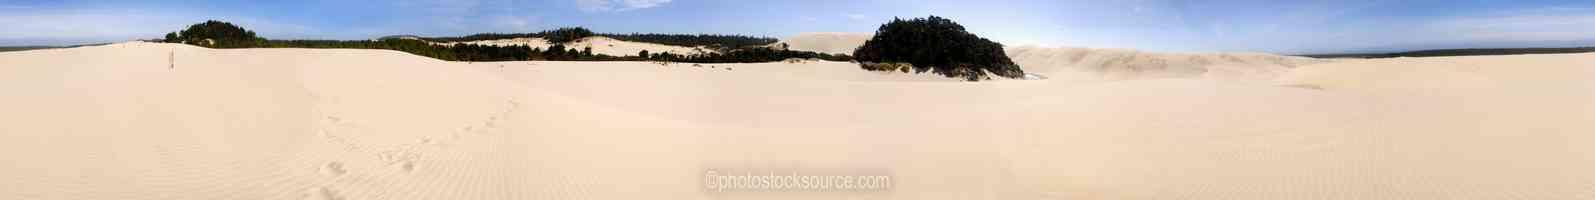 Honeyman Park Dunes